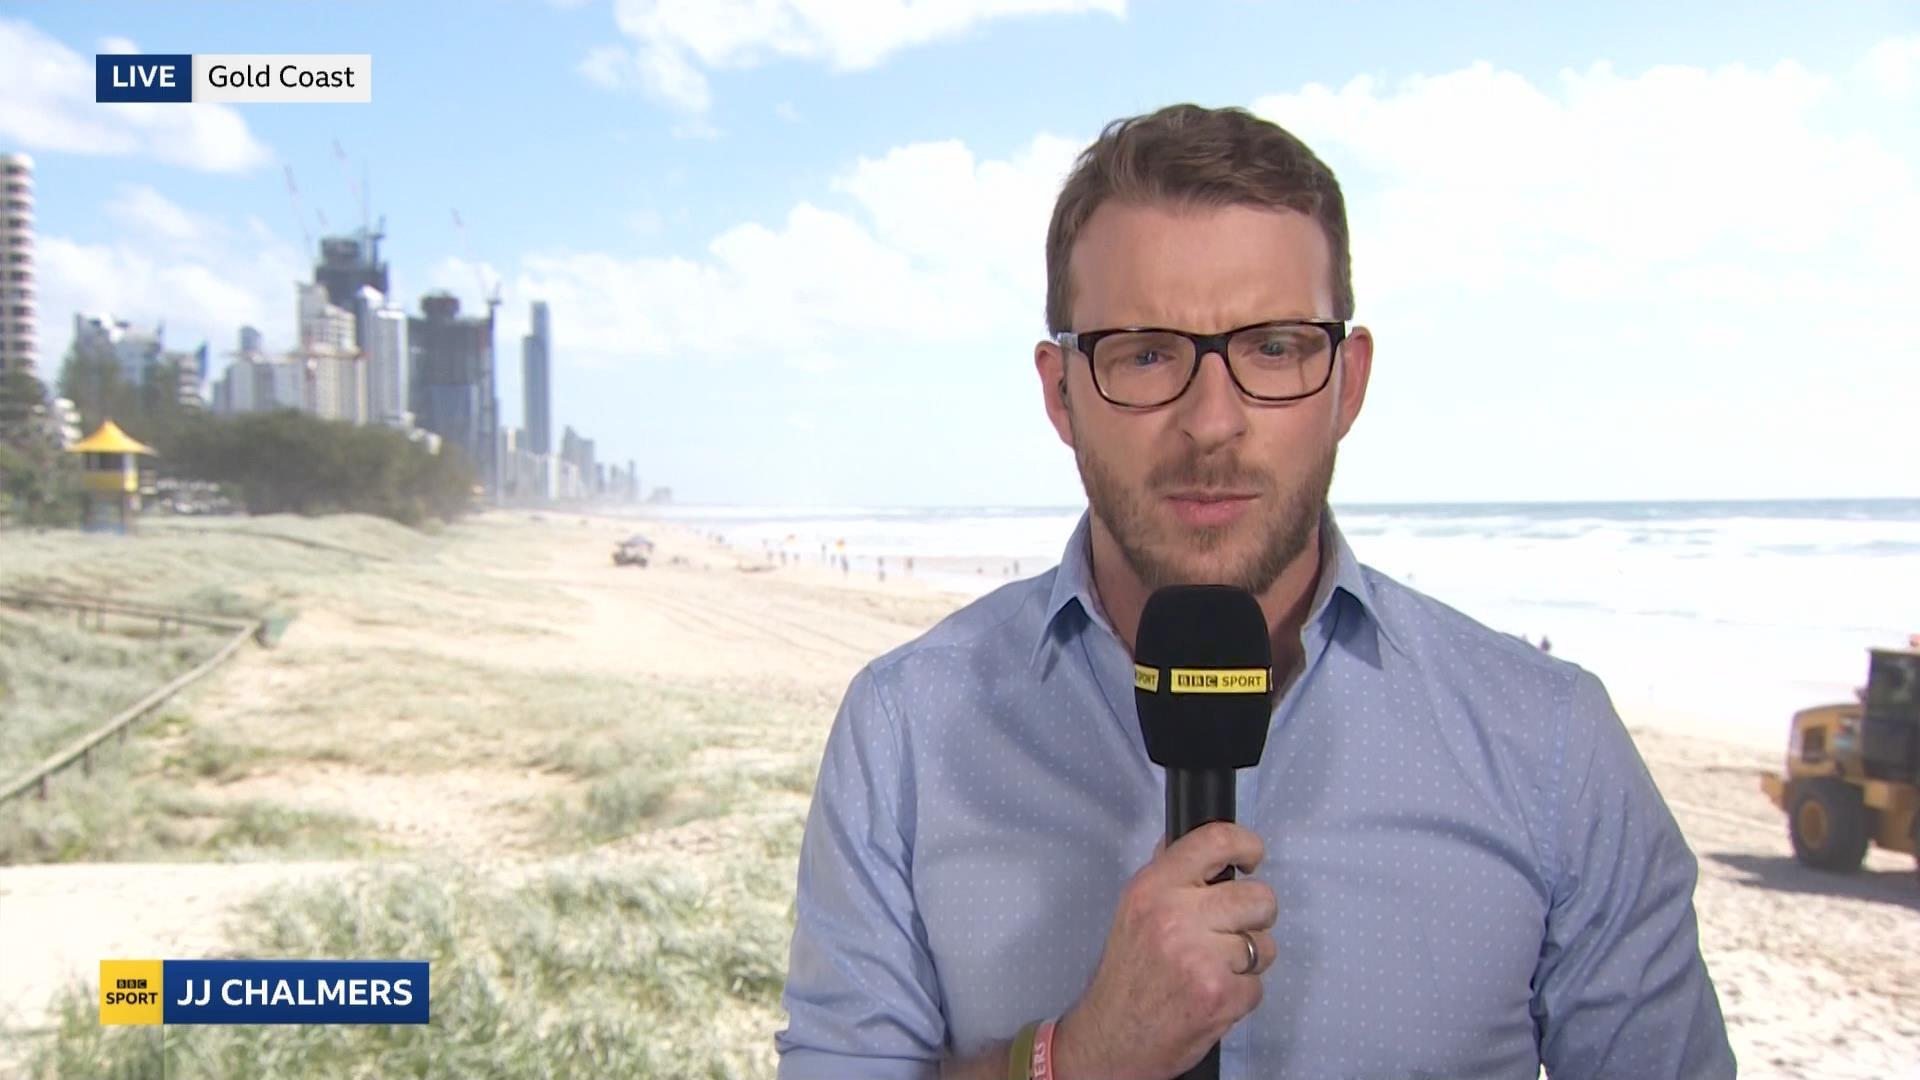 John-James JJ Chalmers - BBC Sport Presenter - Commonwealth Games 2018 (1)